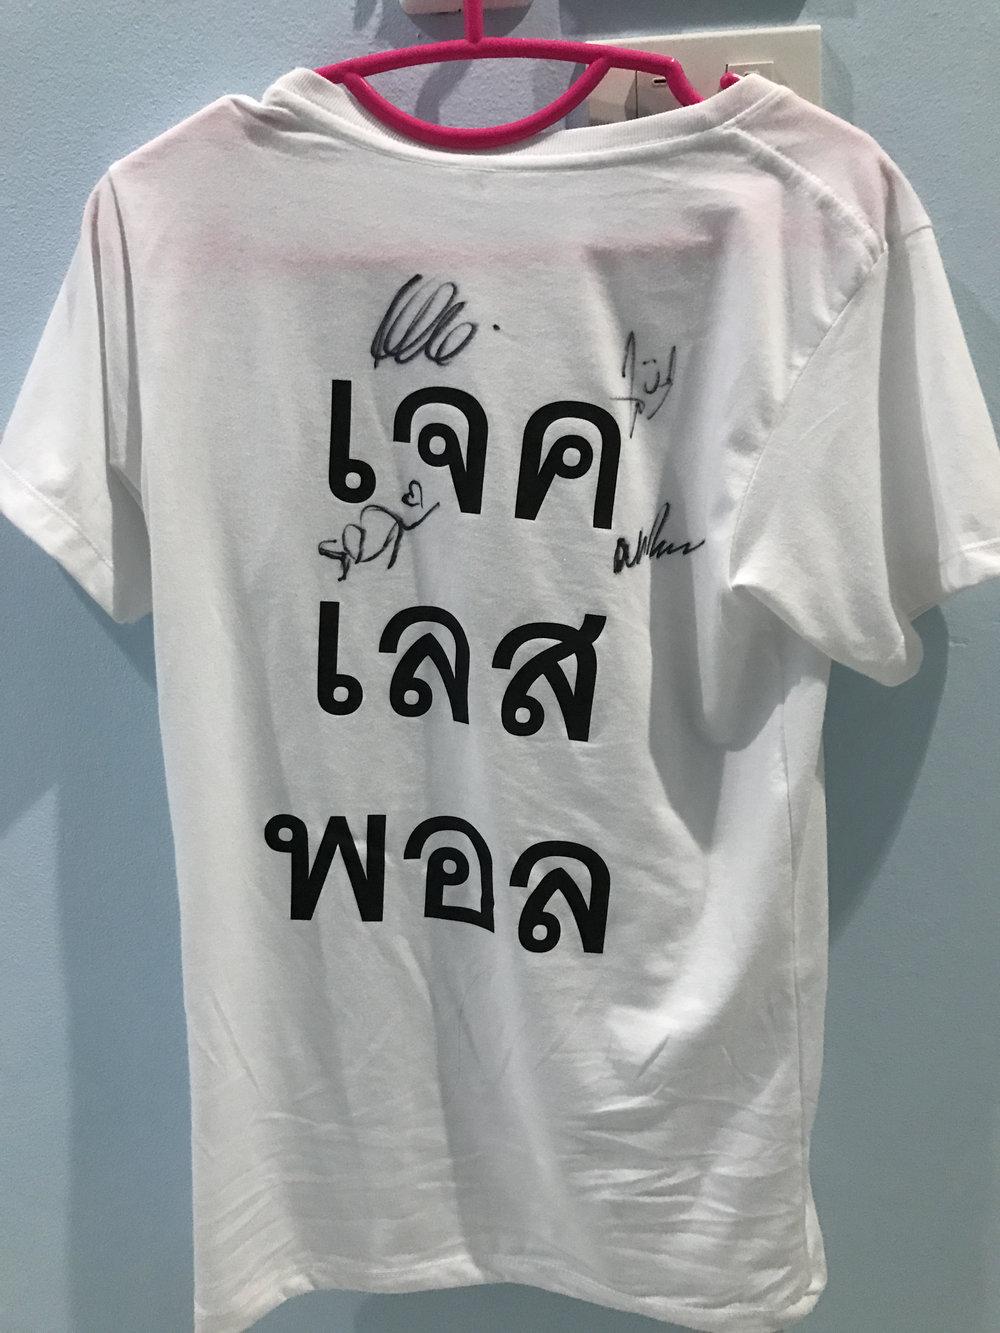 lanypic9.jpg